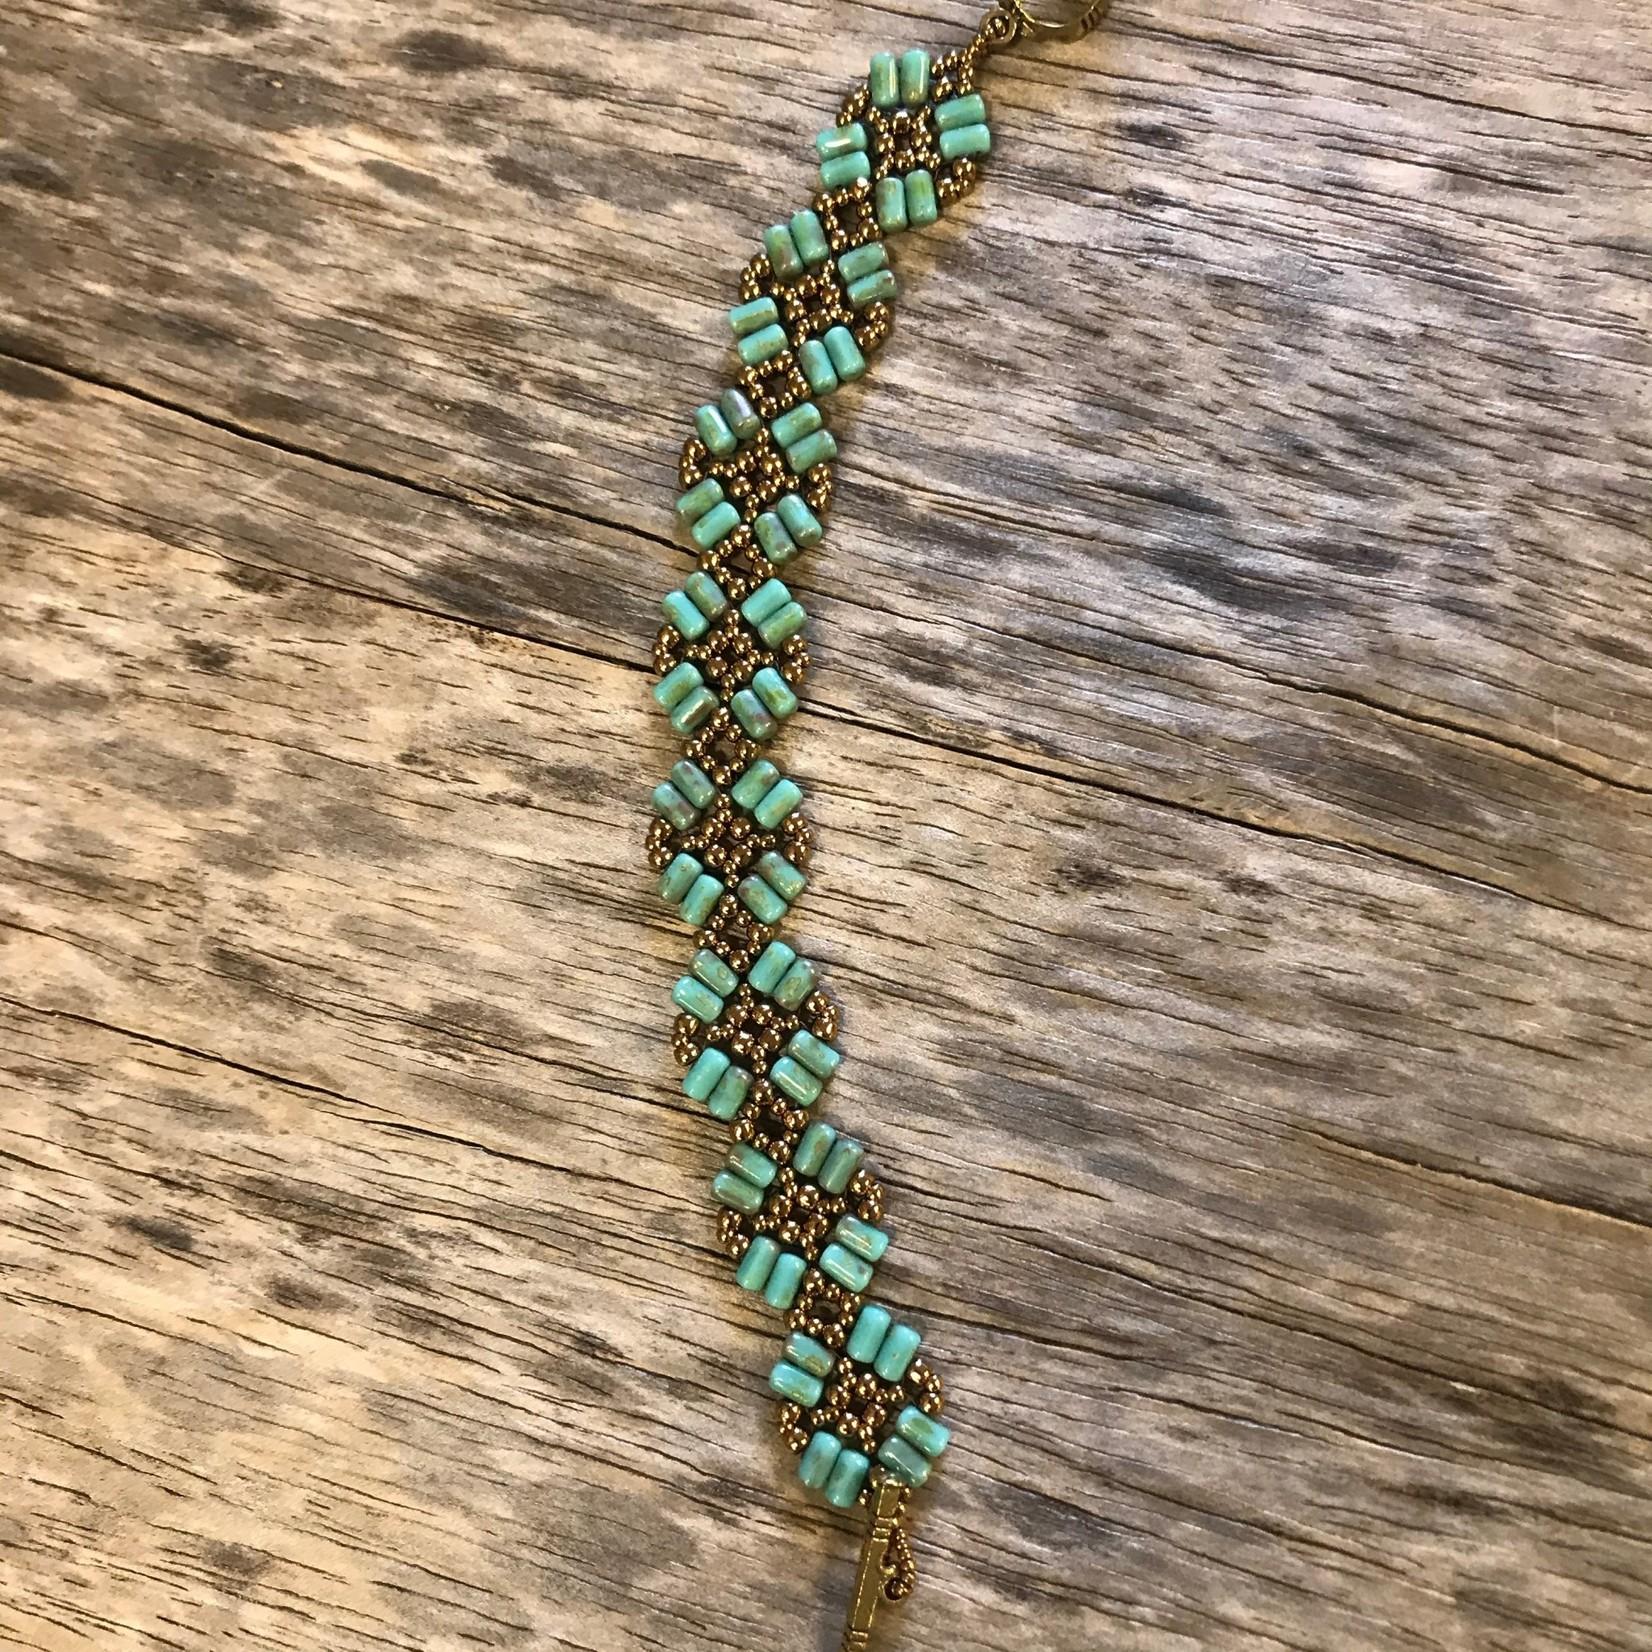 Jeanne Shuff Jeanne Marie Jewelry Bracelet - Turquoise Chech Rula Beads